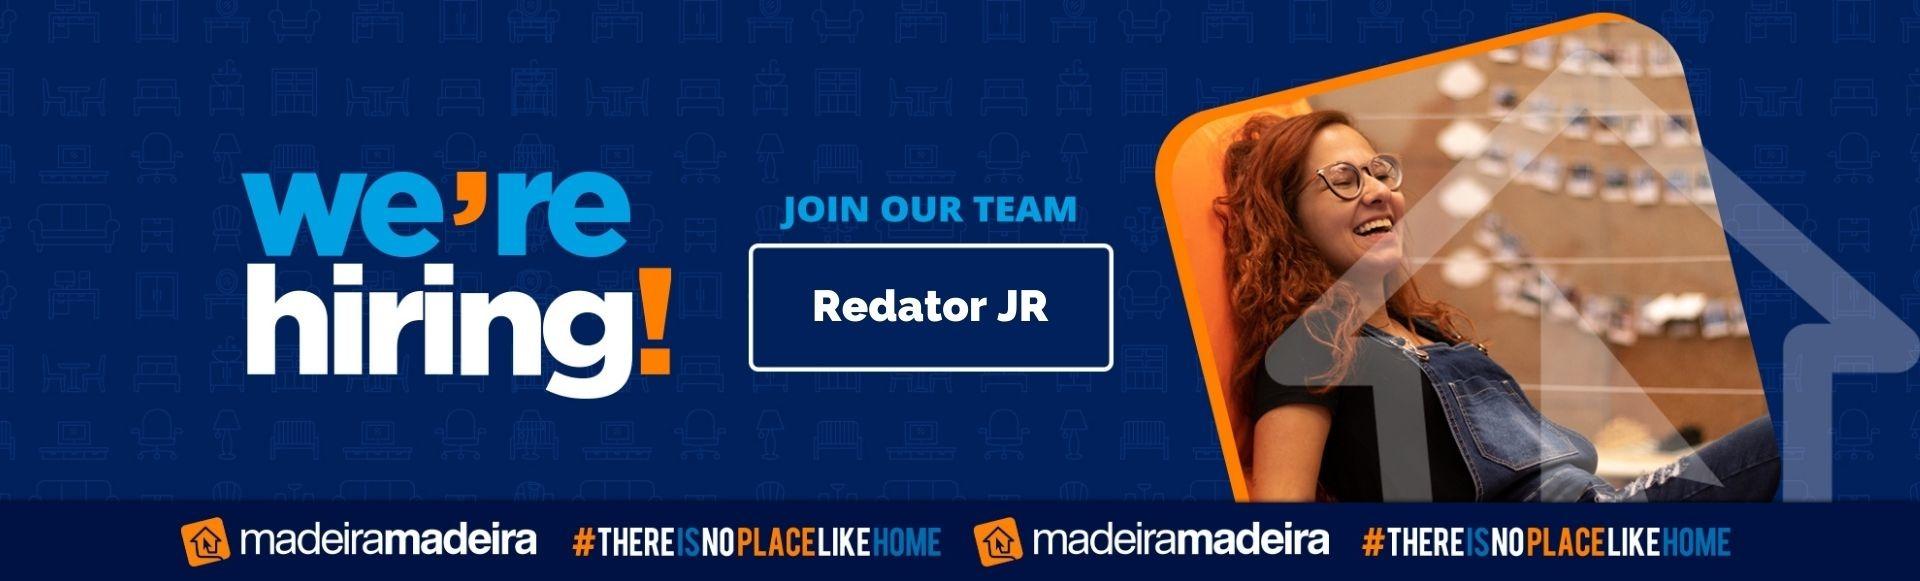 Analista de Marketing JR (Redator)